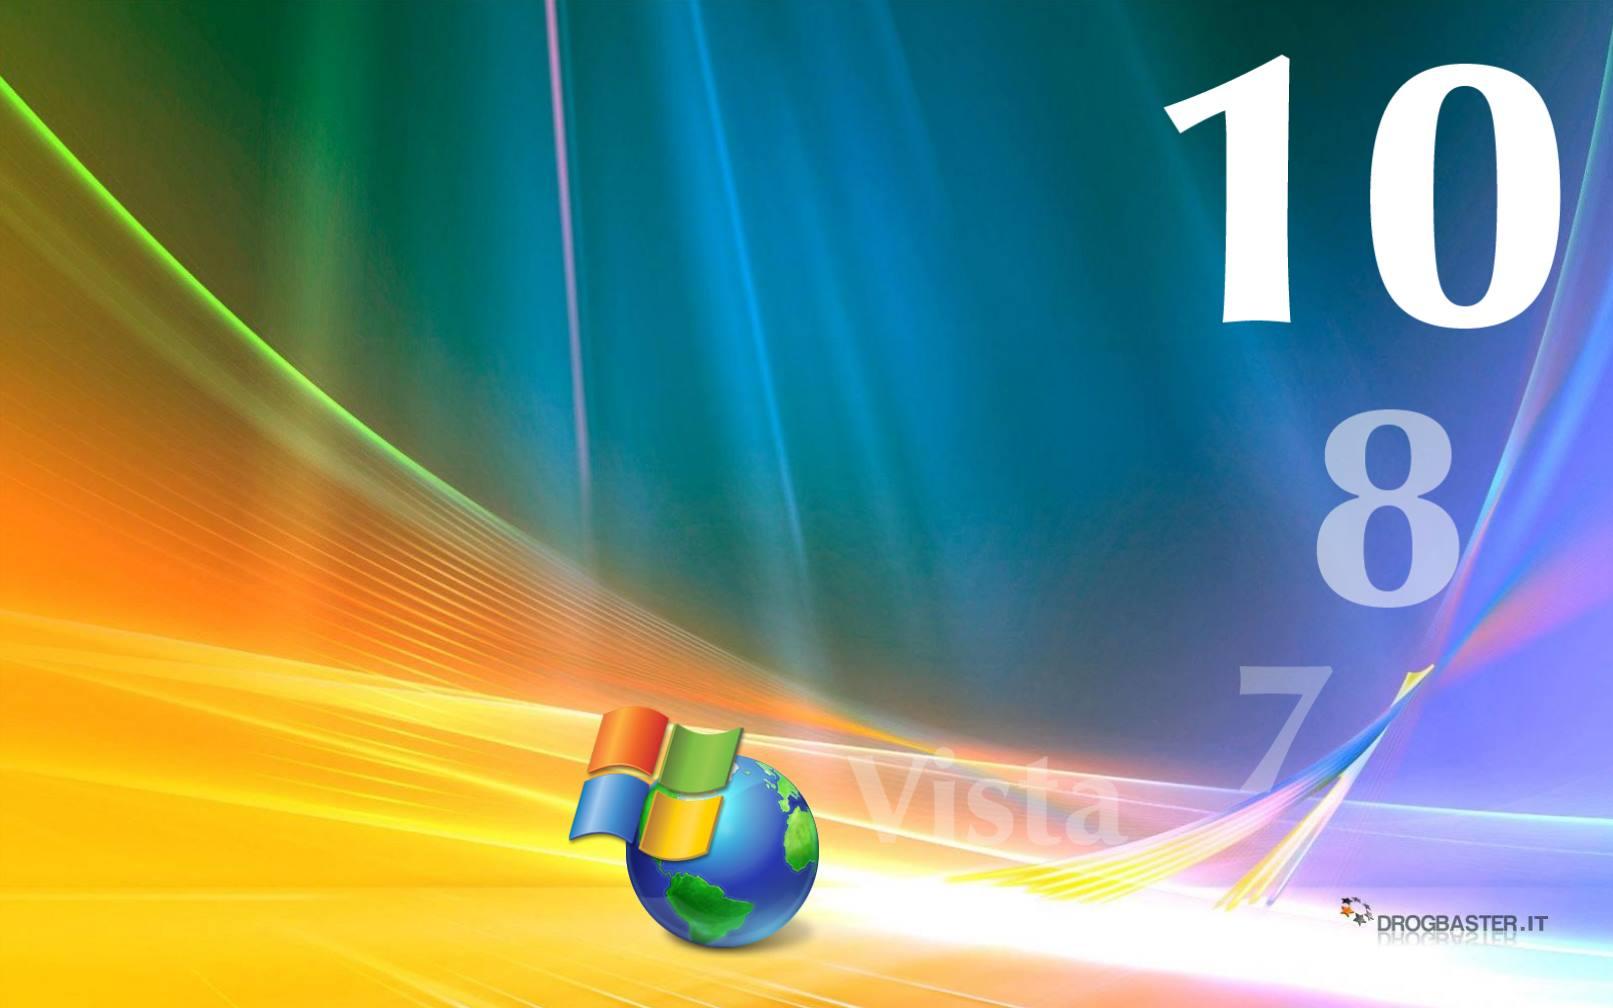 Raccolta Di Sfondi Windows 10 Hd Wallpapers